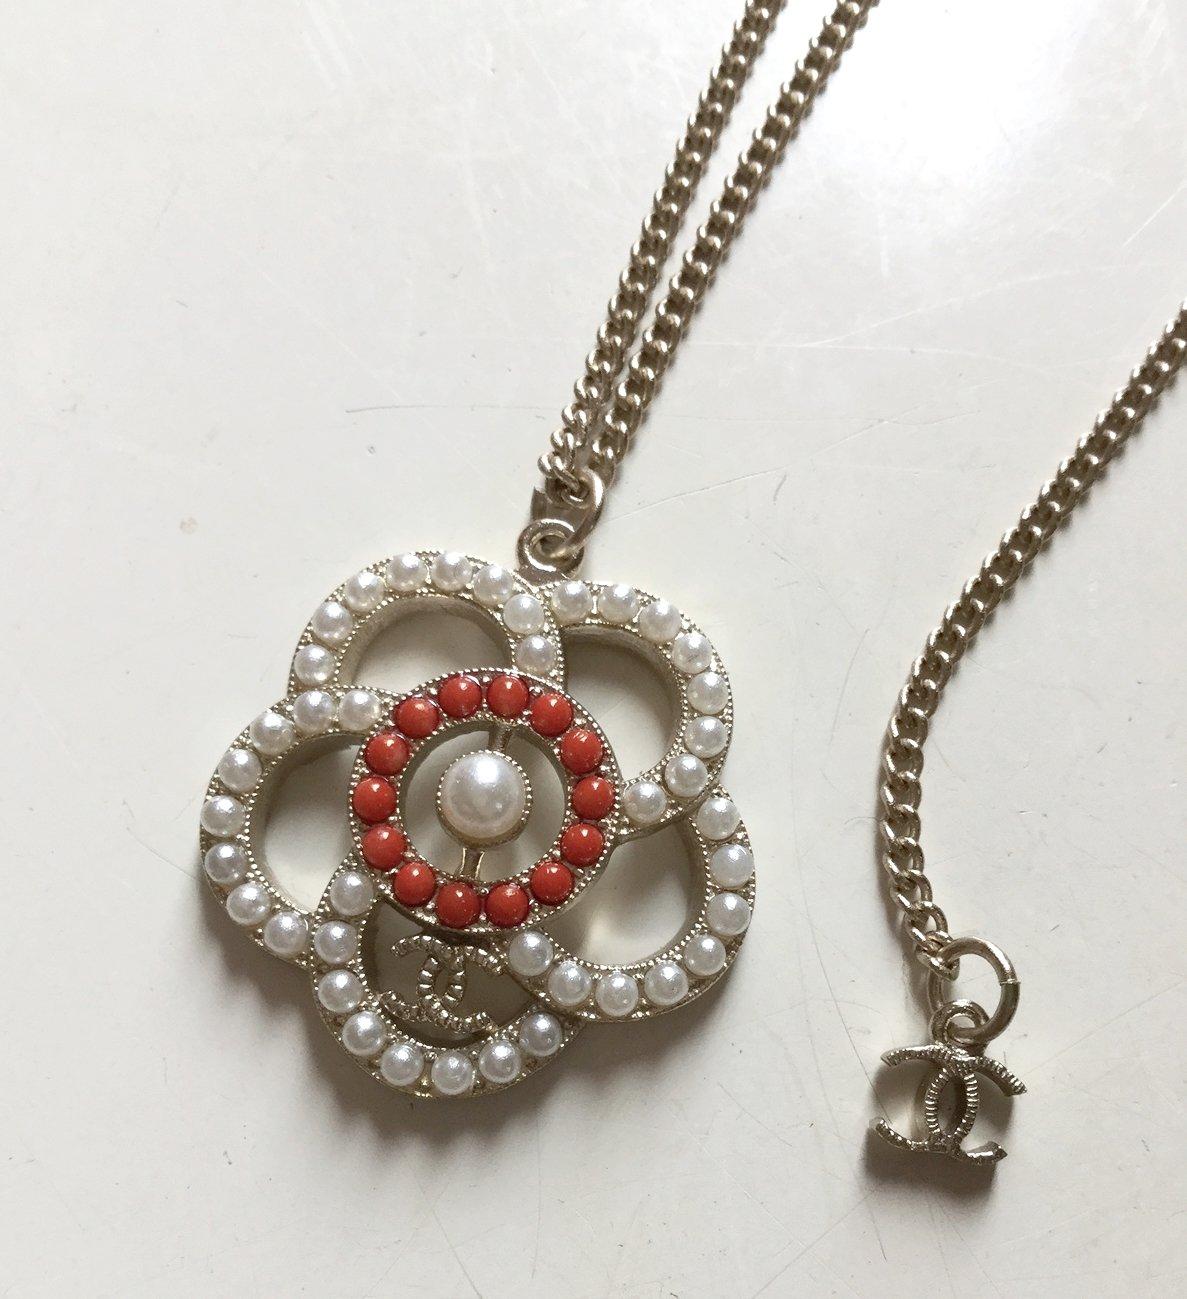 CHANEL Camellia Pearl White Red CC Pendant Necklace GOLD Chain Authentic NIB